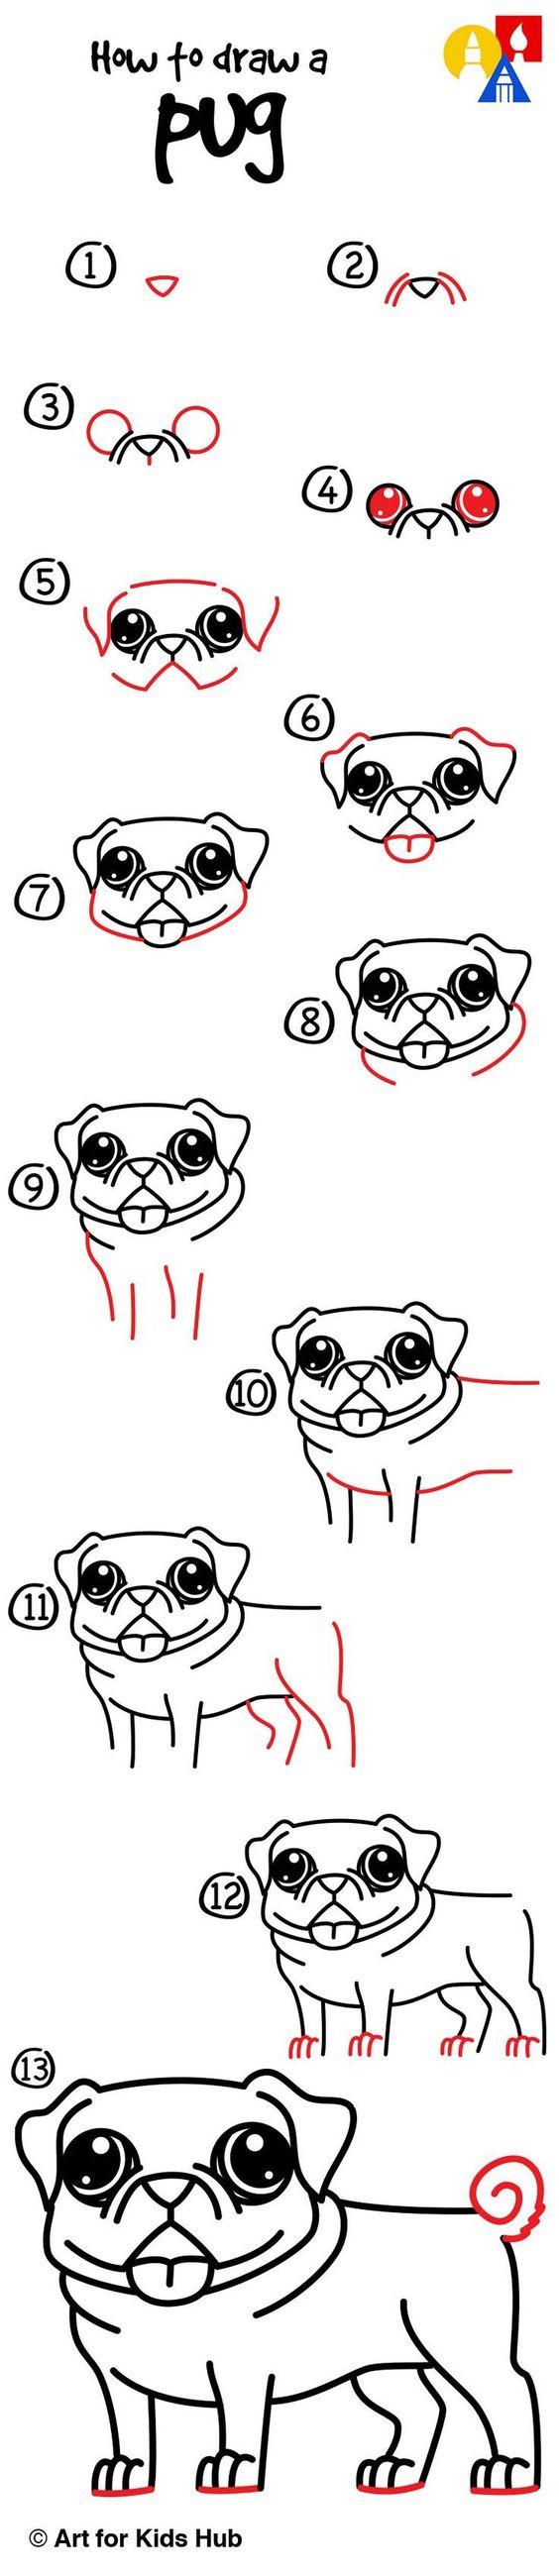 how to draw art for kids hub minecraft